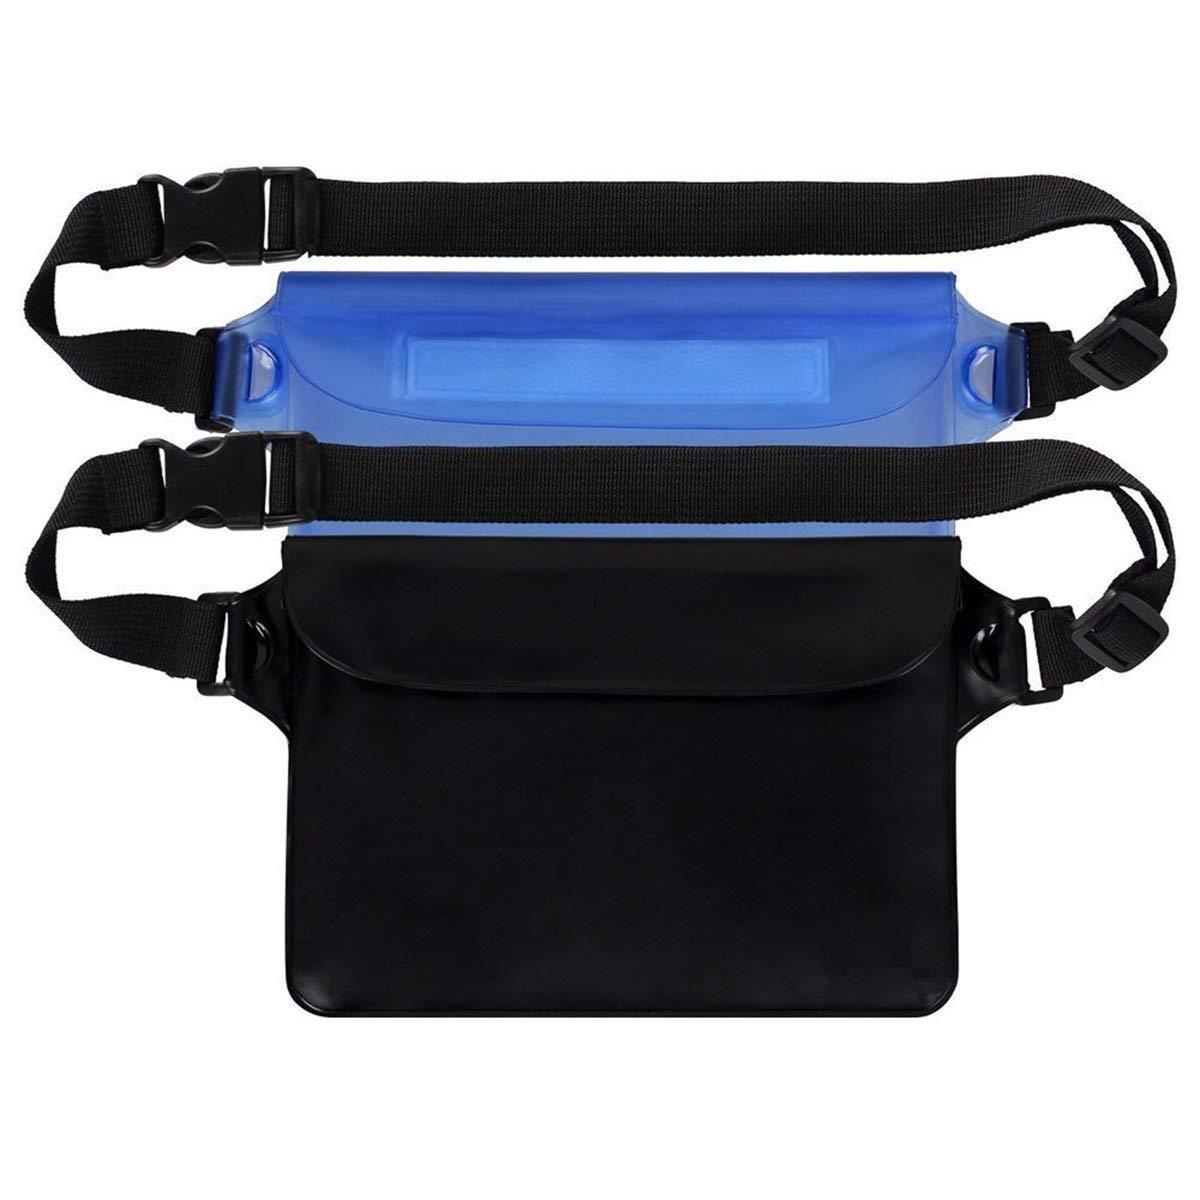 Get Quotations Winomo 2pcs Waterproof Pouch Bag Sport Running Waist Belt For Phone Camera Wallet Beach Fishing